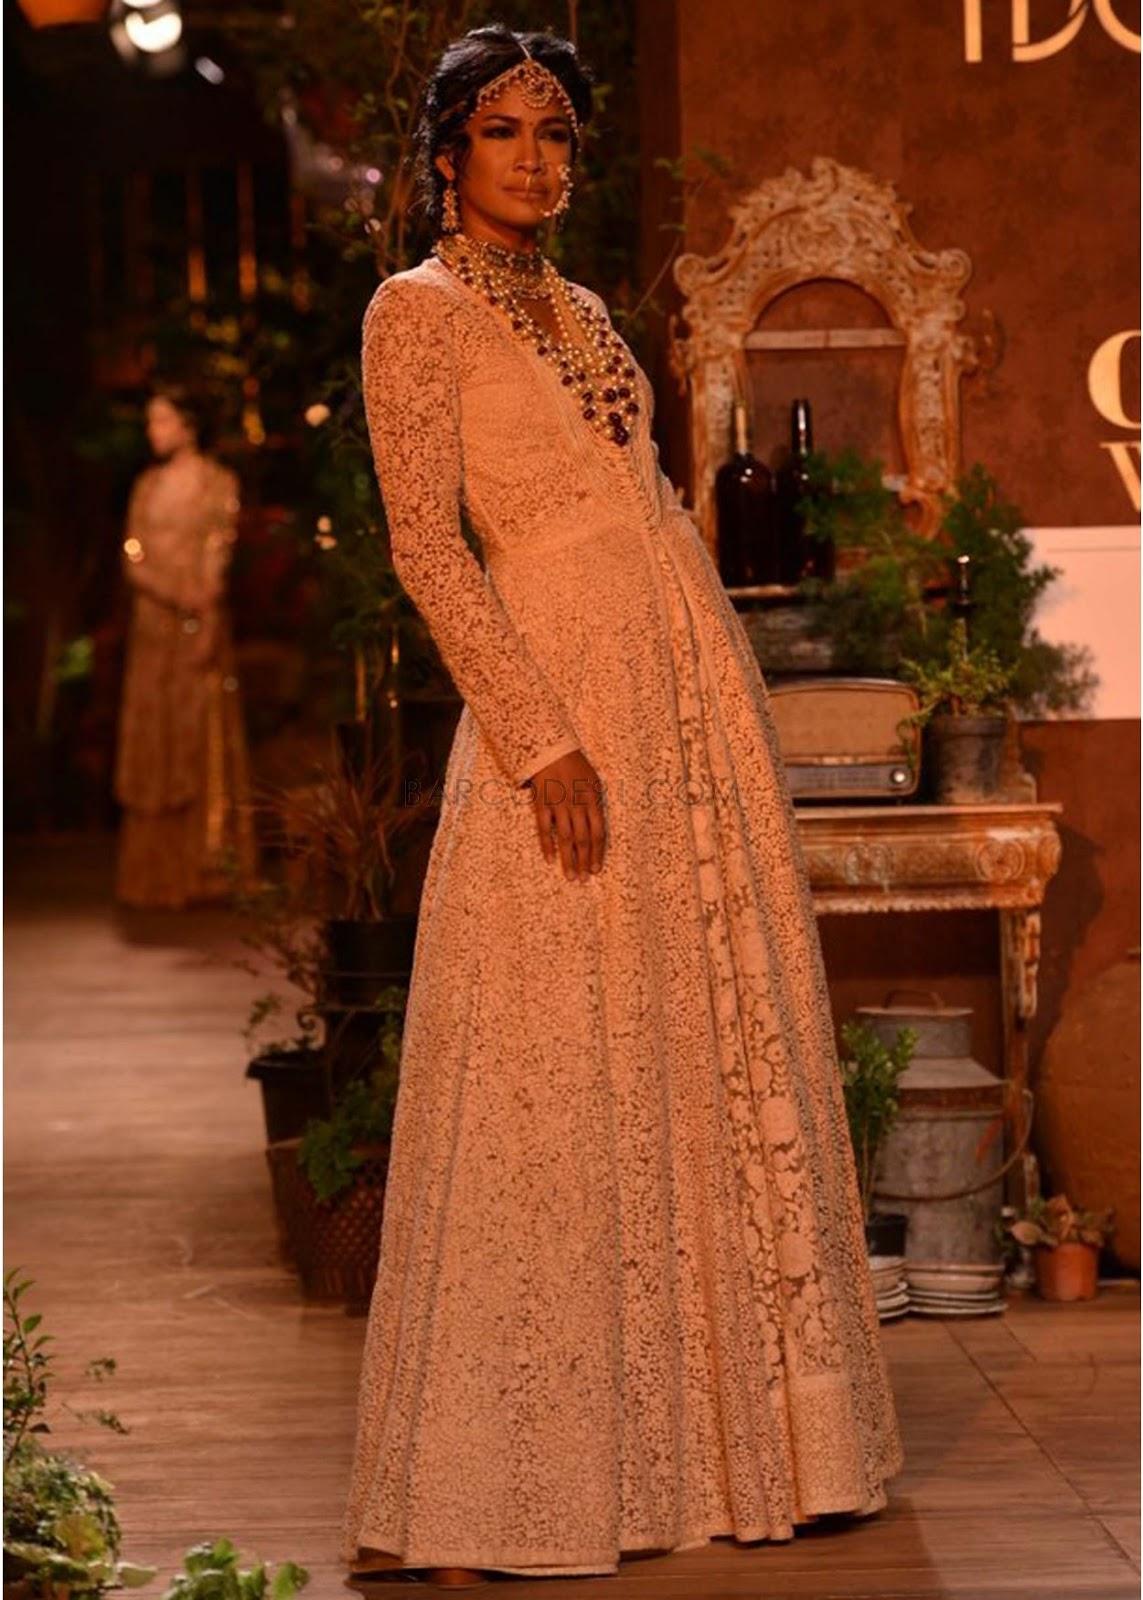 Sabyasachi Collection at PCJ Delhi Couture Week 2013 ... Sabyasachi Anarkali 2014